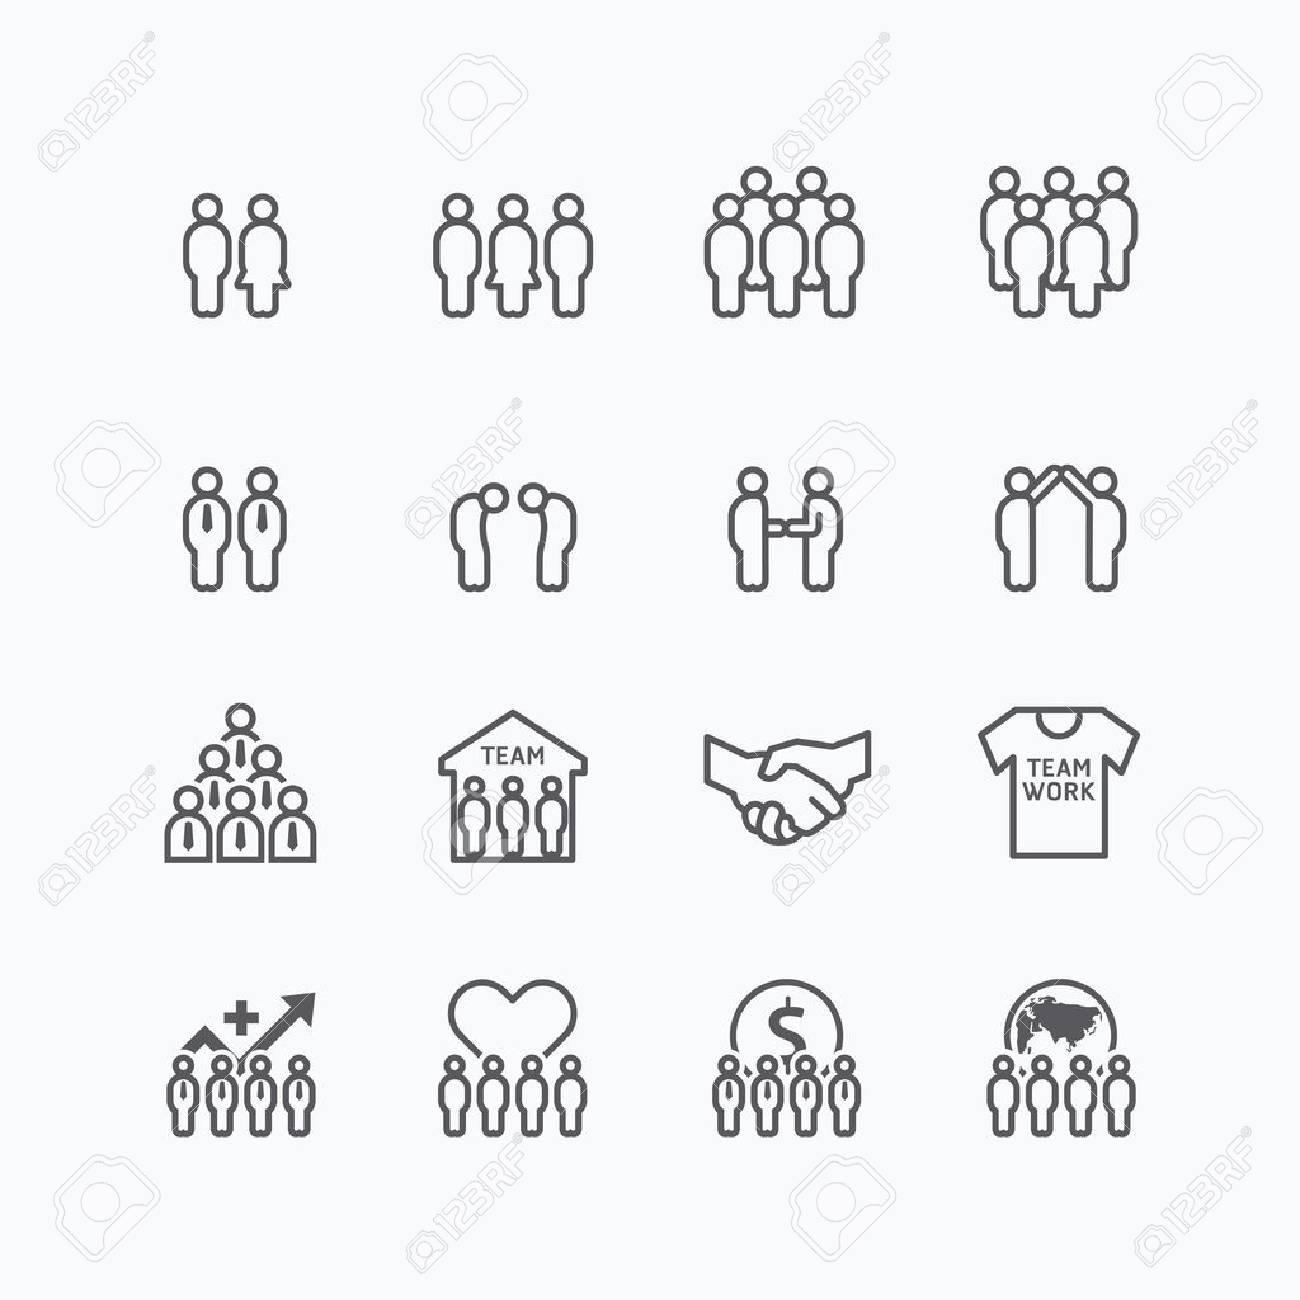 team and business silhouette icons flat line design vector set. teamwork to success concept. Standard-Bild - 43194332